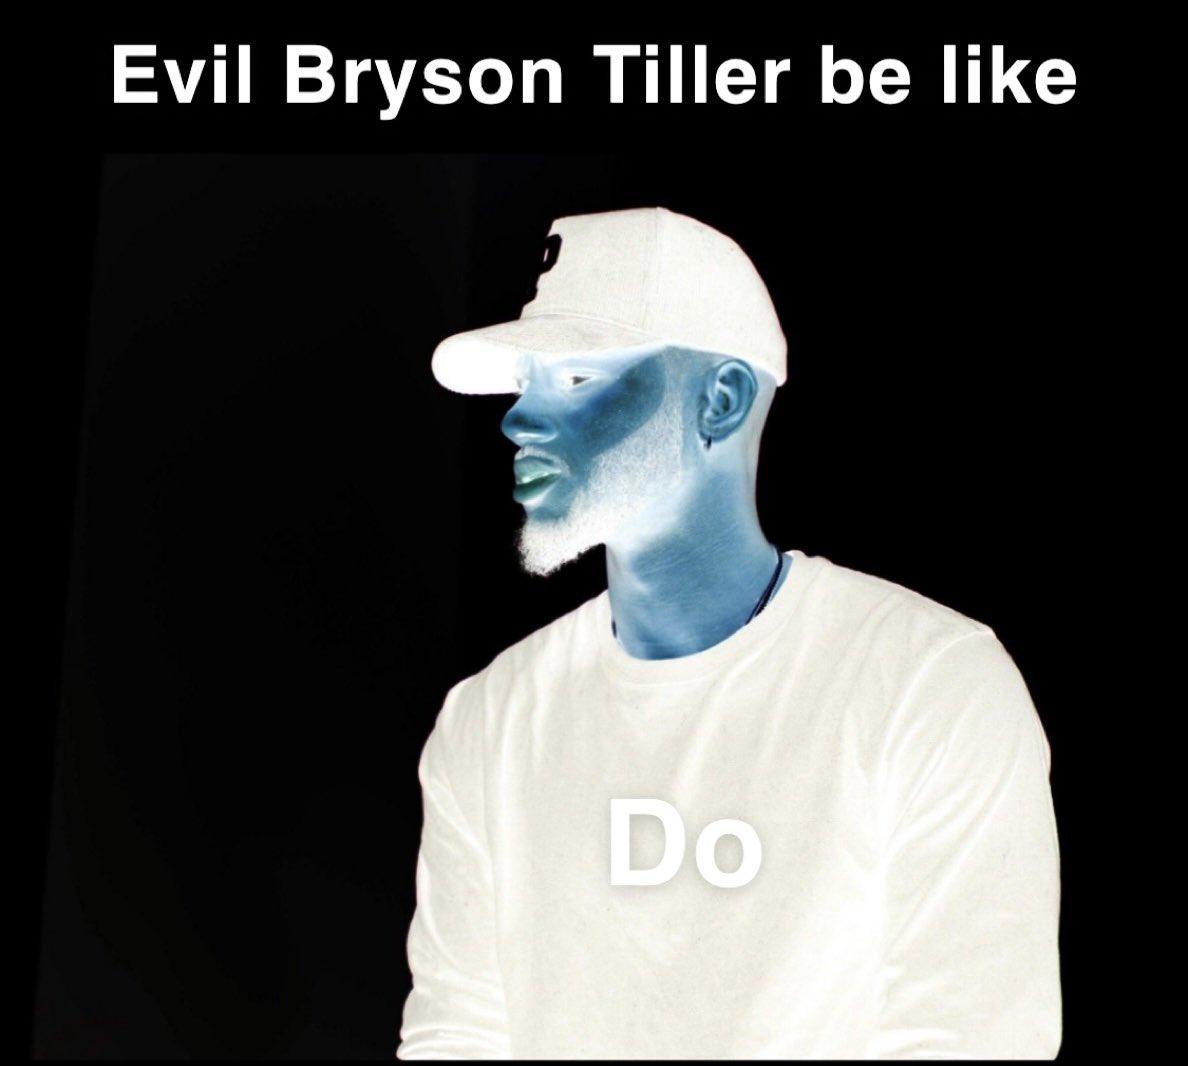 RT @fejherson: Evil Bryson Tiller be like https://t.co/lKFS0tdjjB